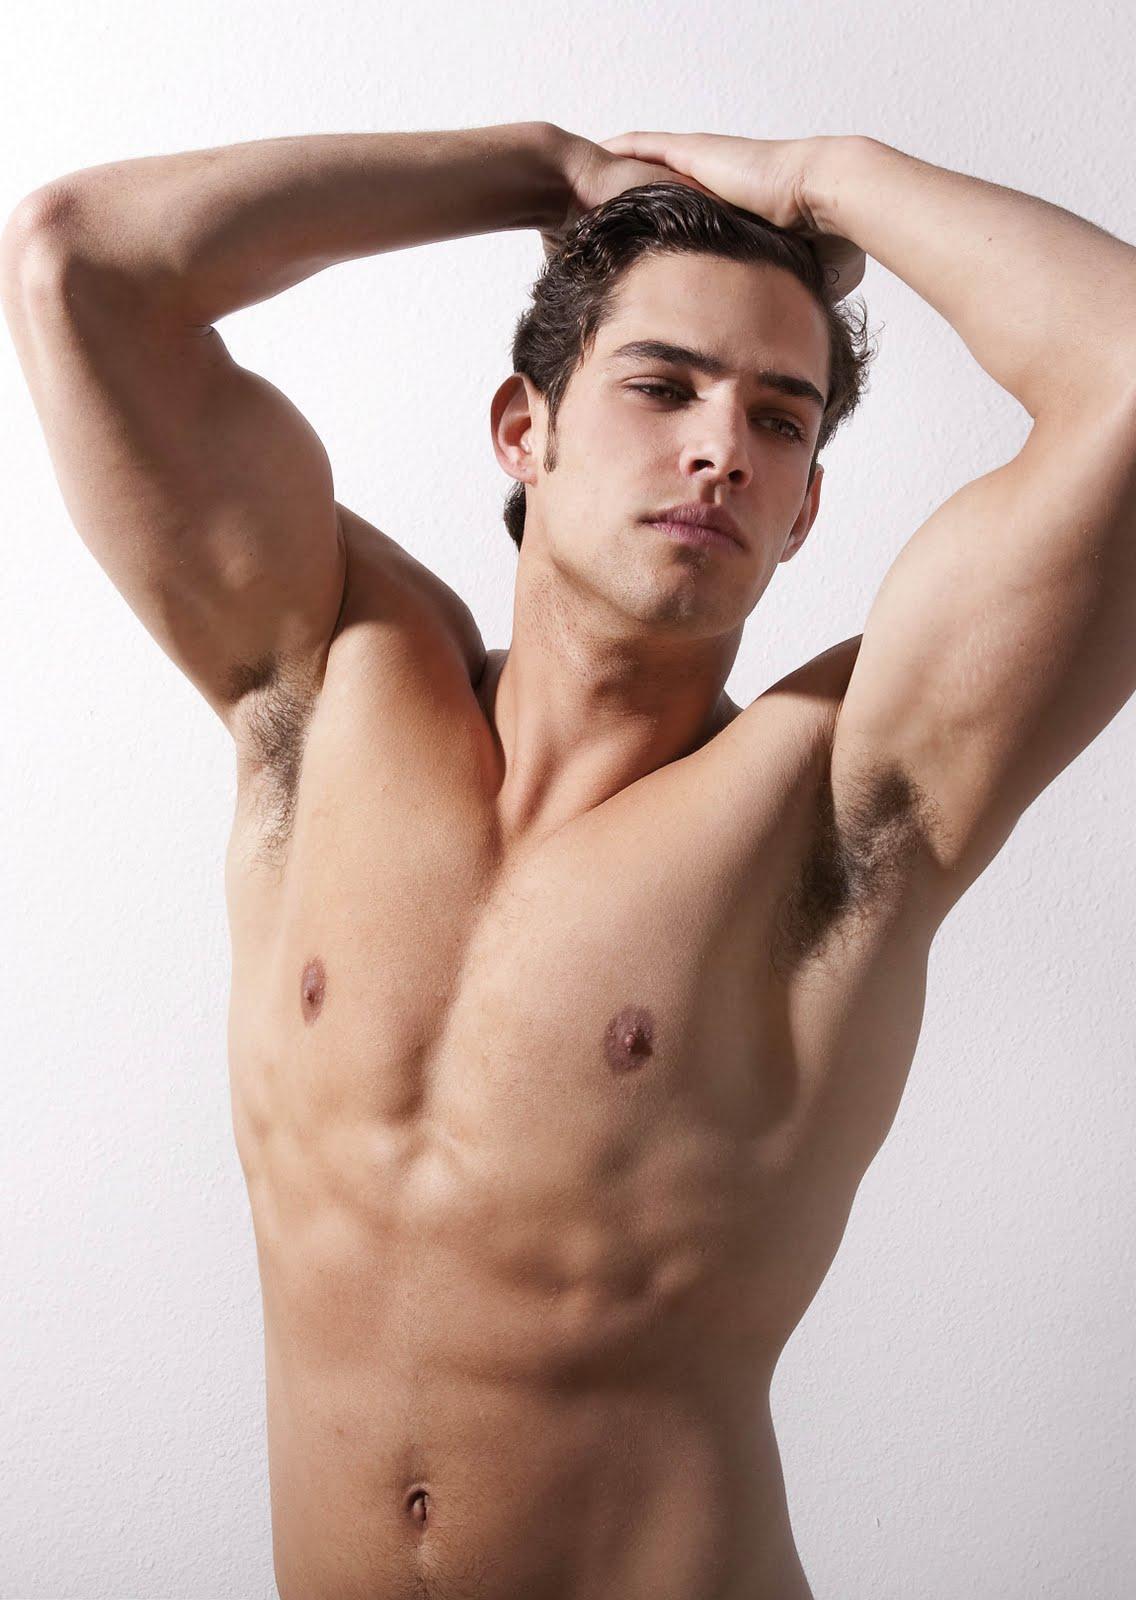 Man Crush Of The Day Model Landon Falgoust  The Man Crush Blog-8212